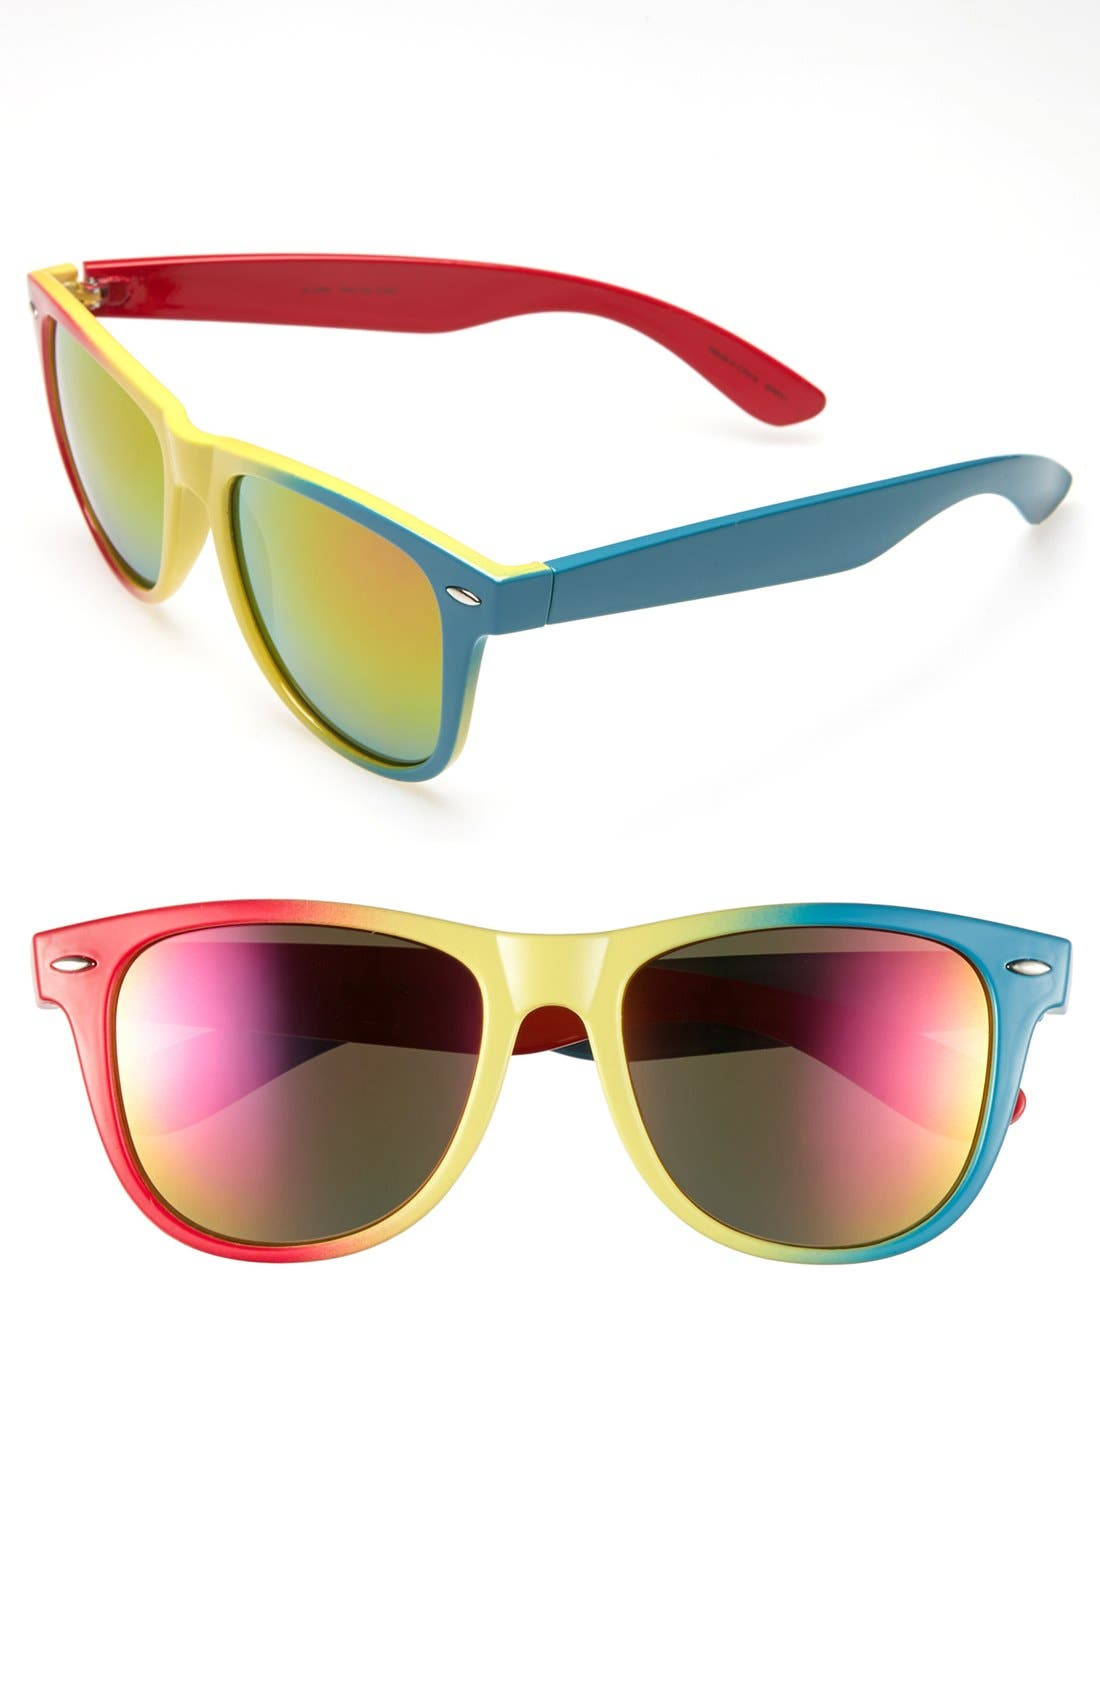 Main Image - Outlook Eyewear 'Alumni' 54mm Sunglasses